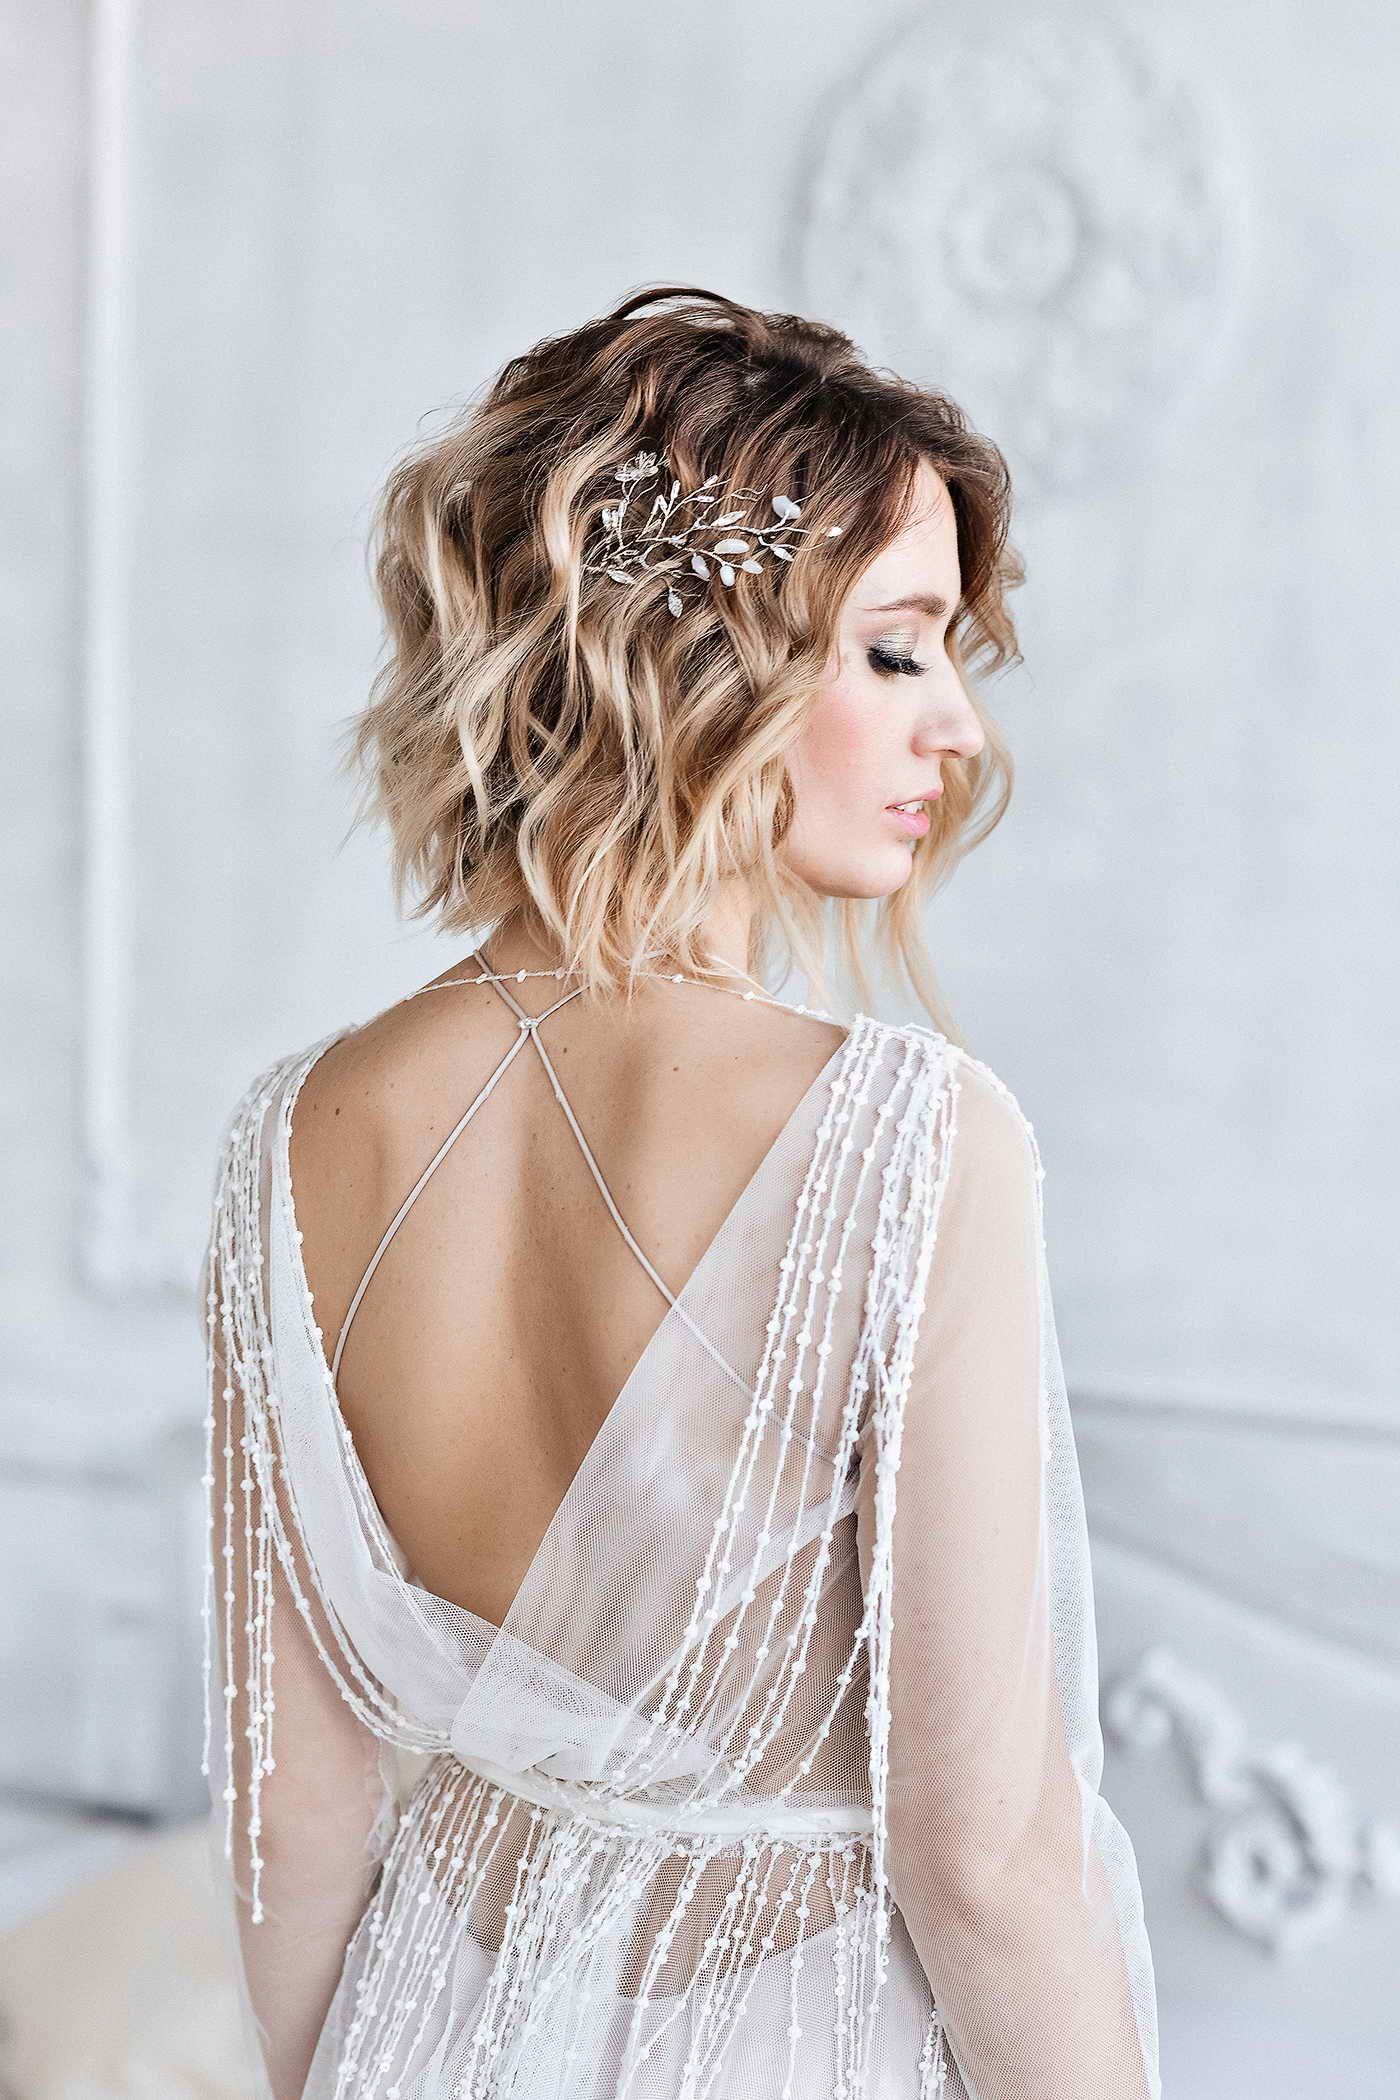 Bridal Hair Sprig Jewelry Silver Sprig Wedding Romantic Jewelry Wedding Hair Pin Wedding Hair C Wedding Hair Clips Short Wedding Hair Wedding Hair Pins [ 2100 x 1400 Pixel ]